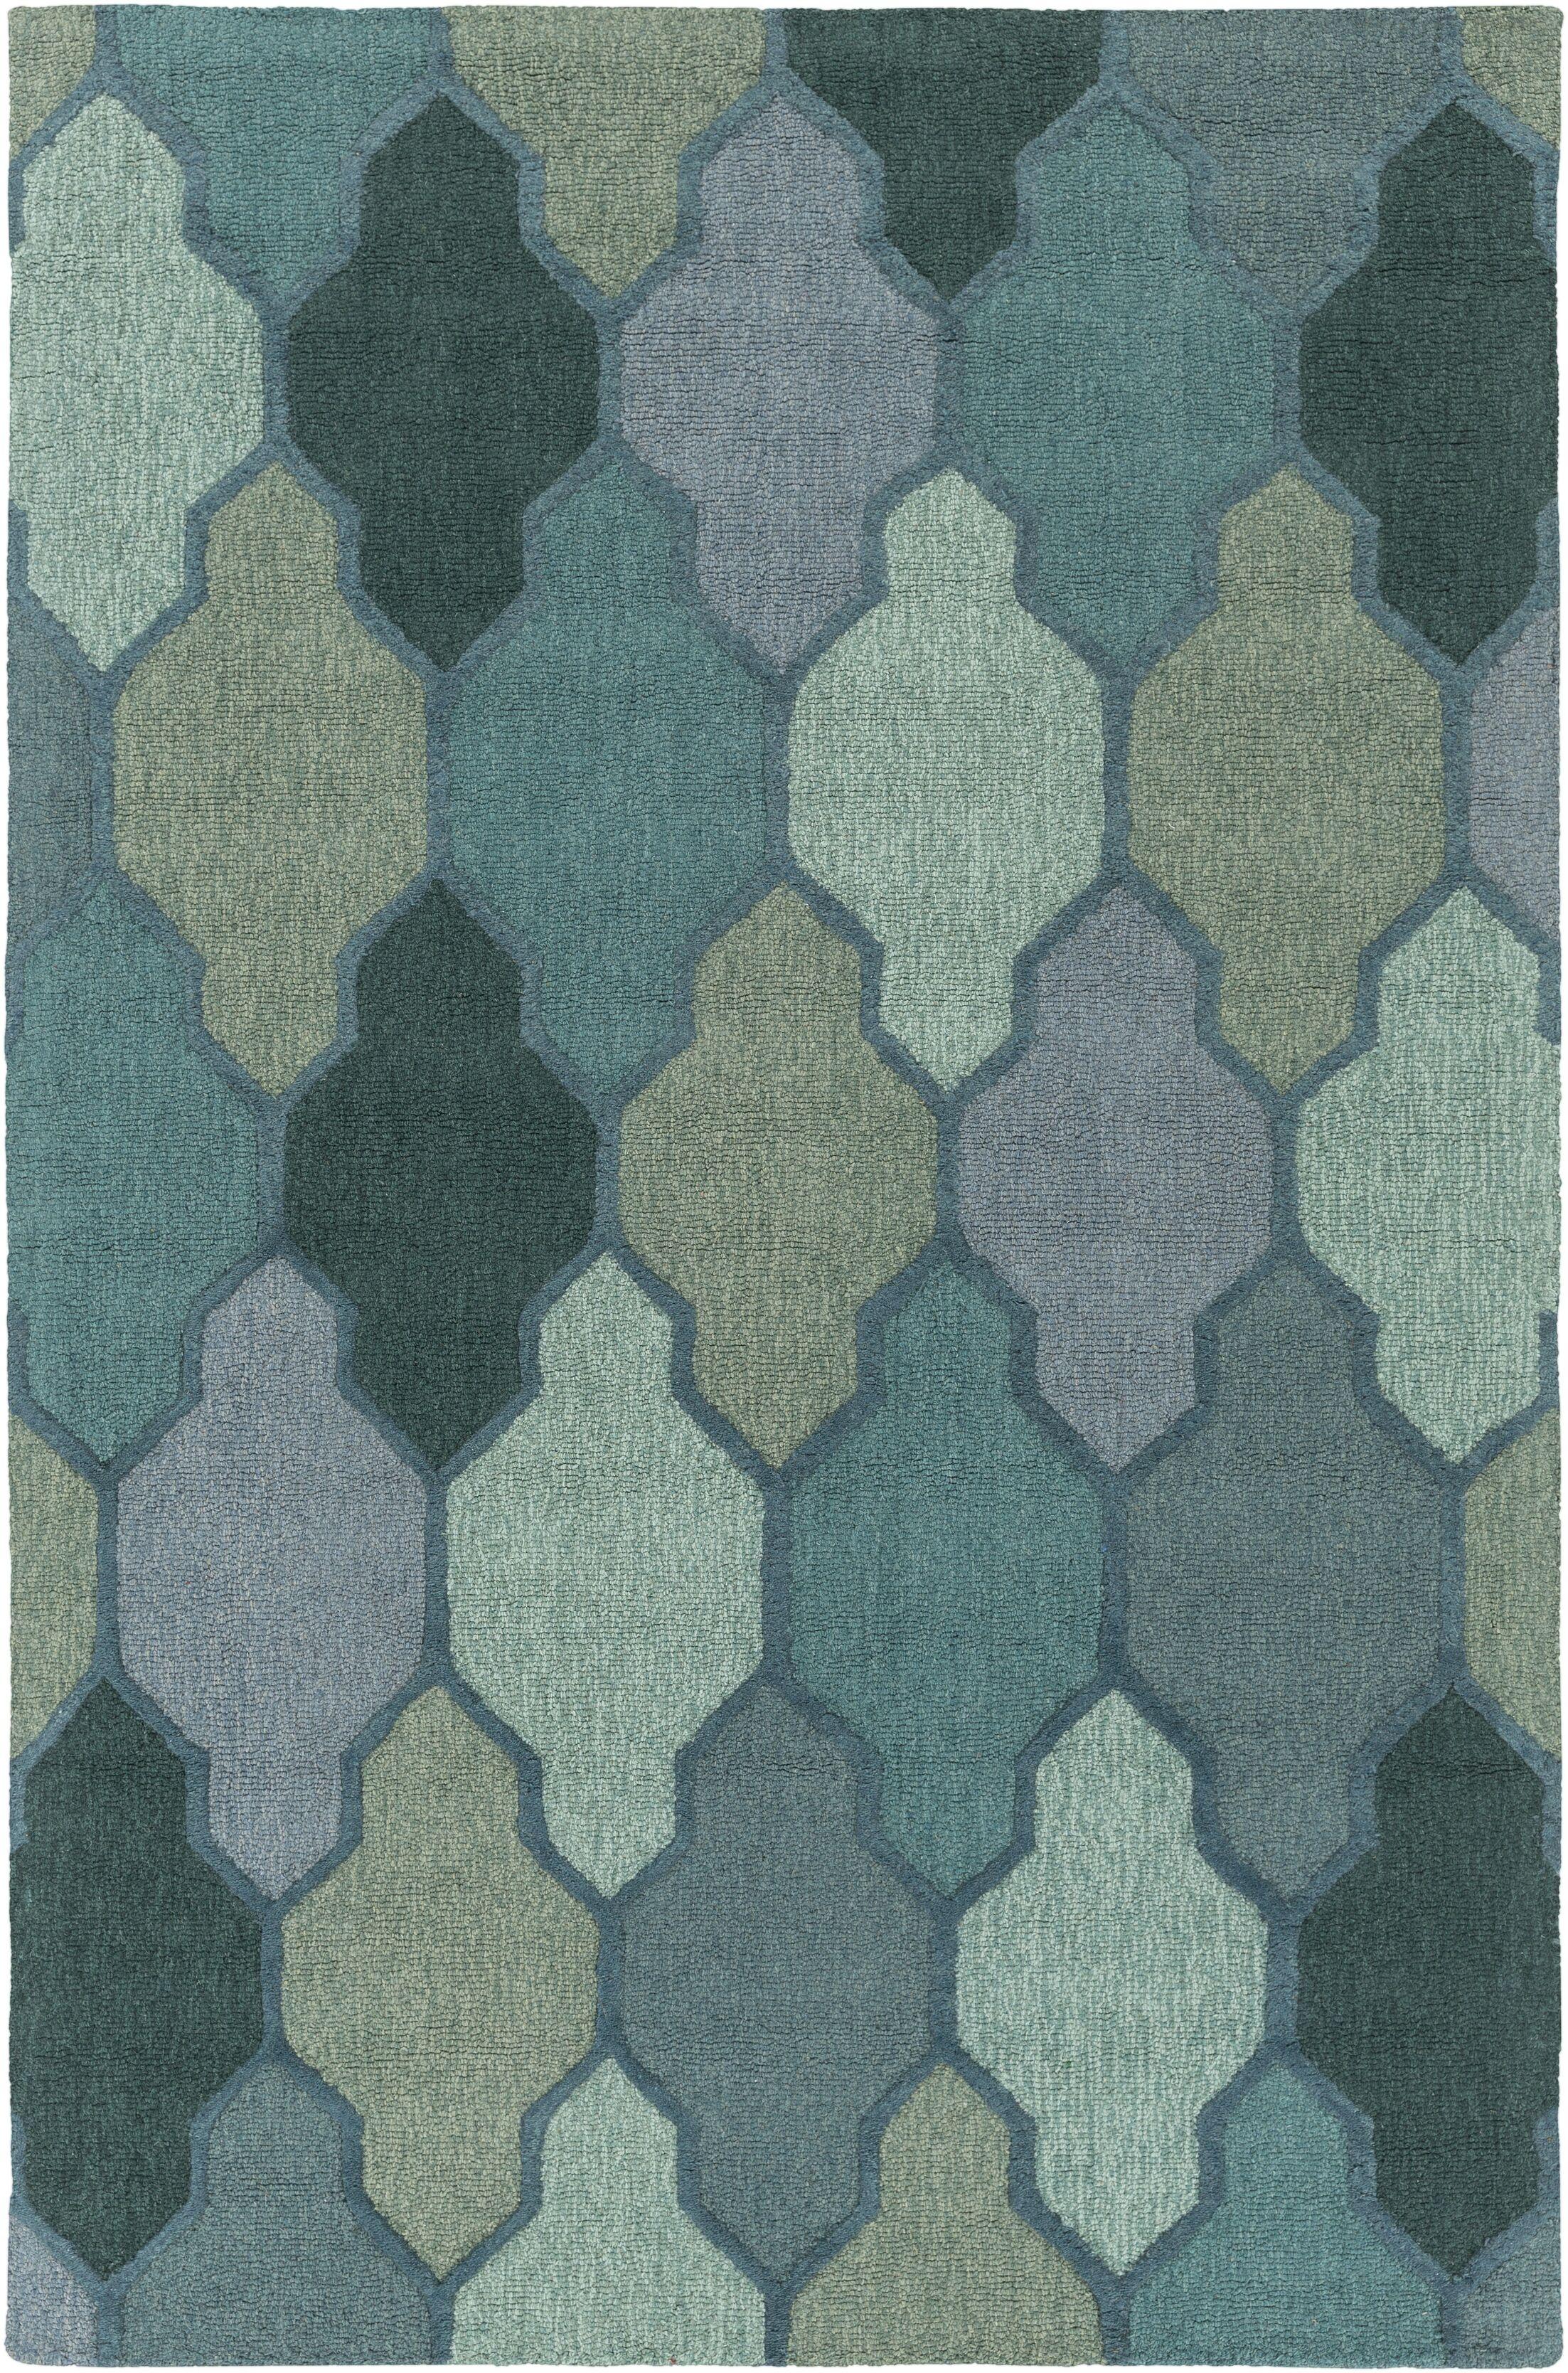 Galya Green Area Rug Rug Size: Rectangle 9' x 13'